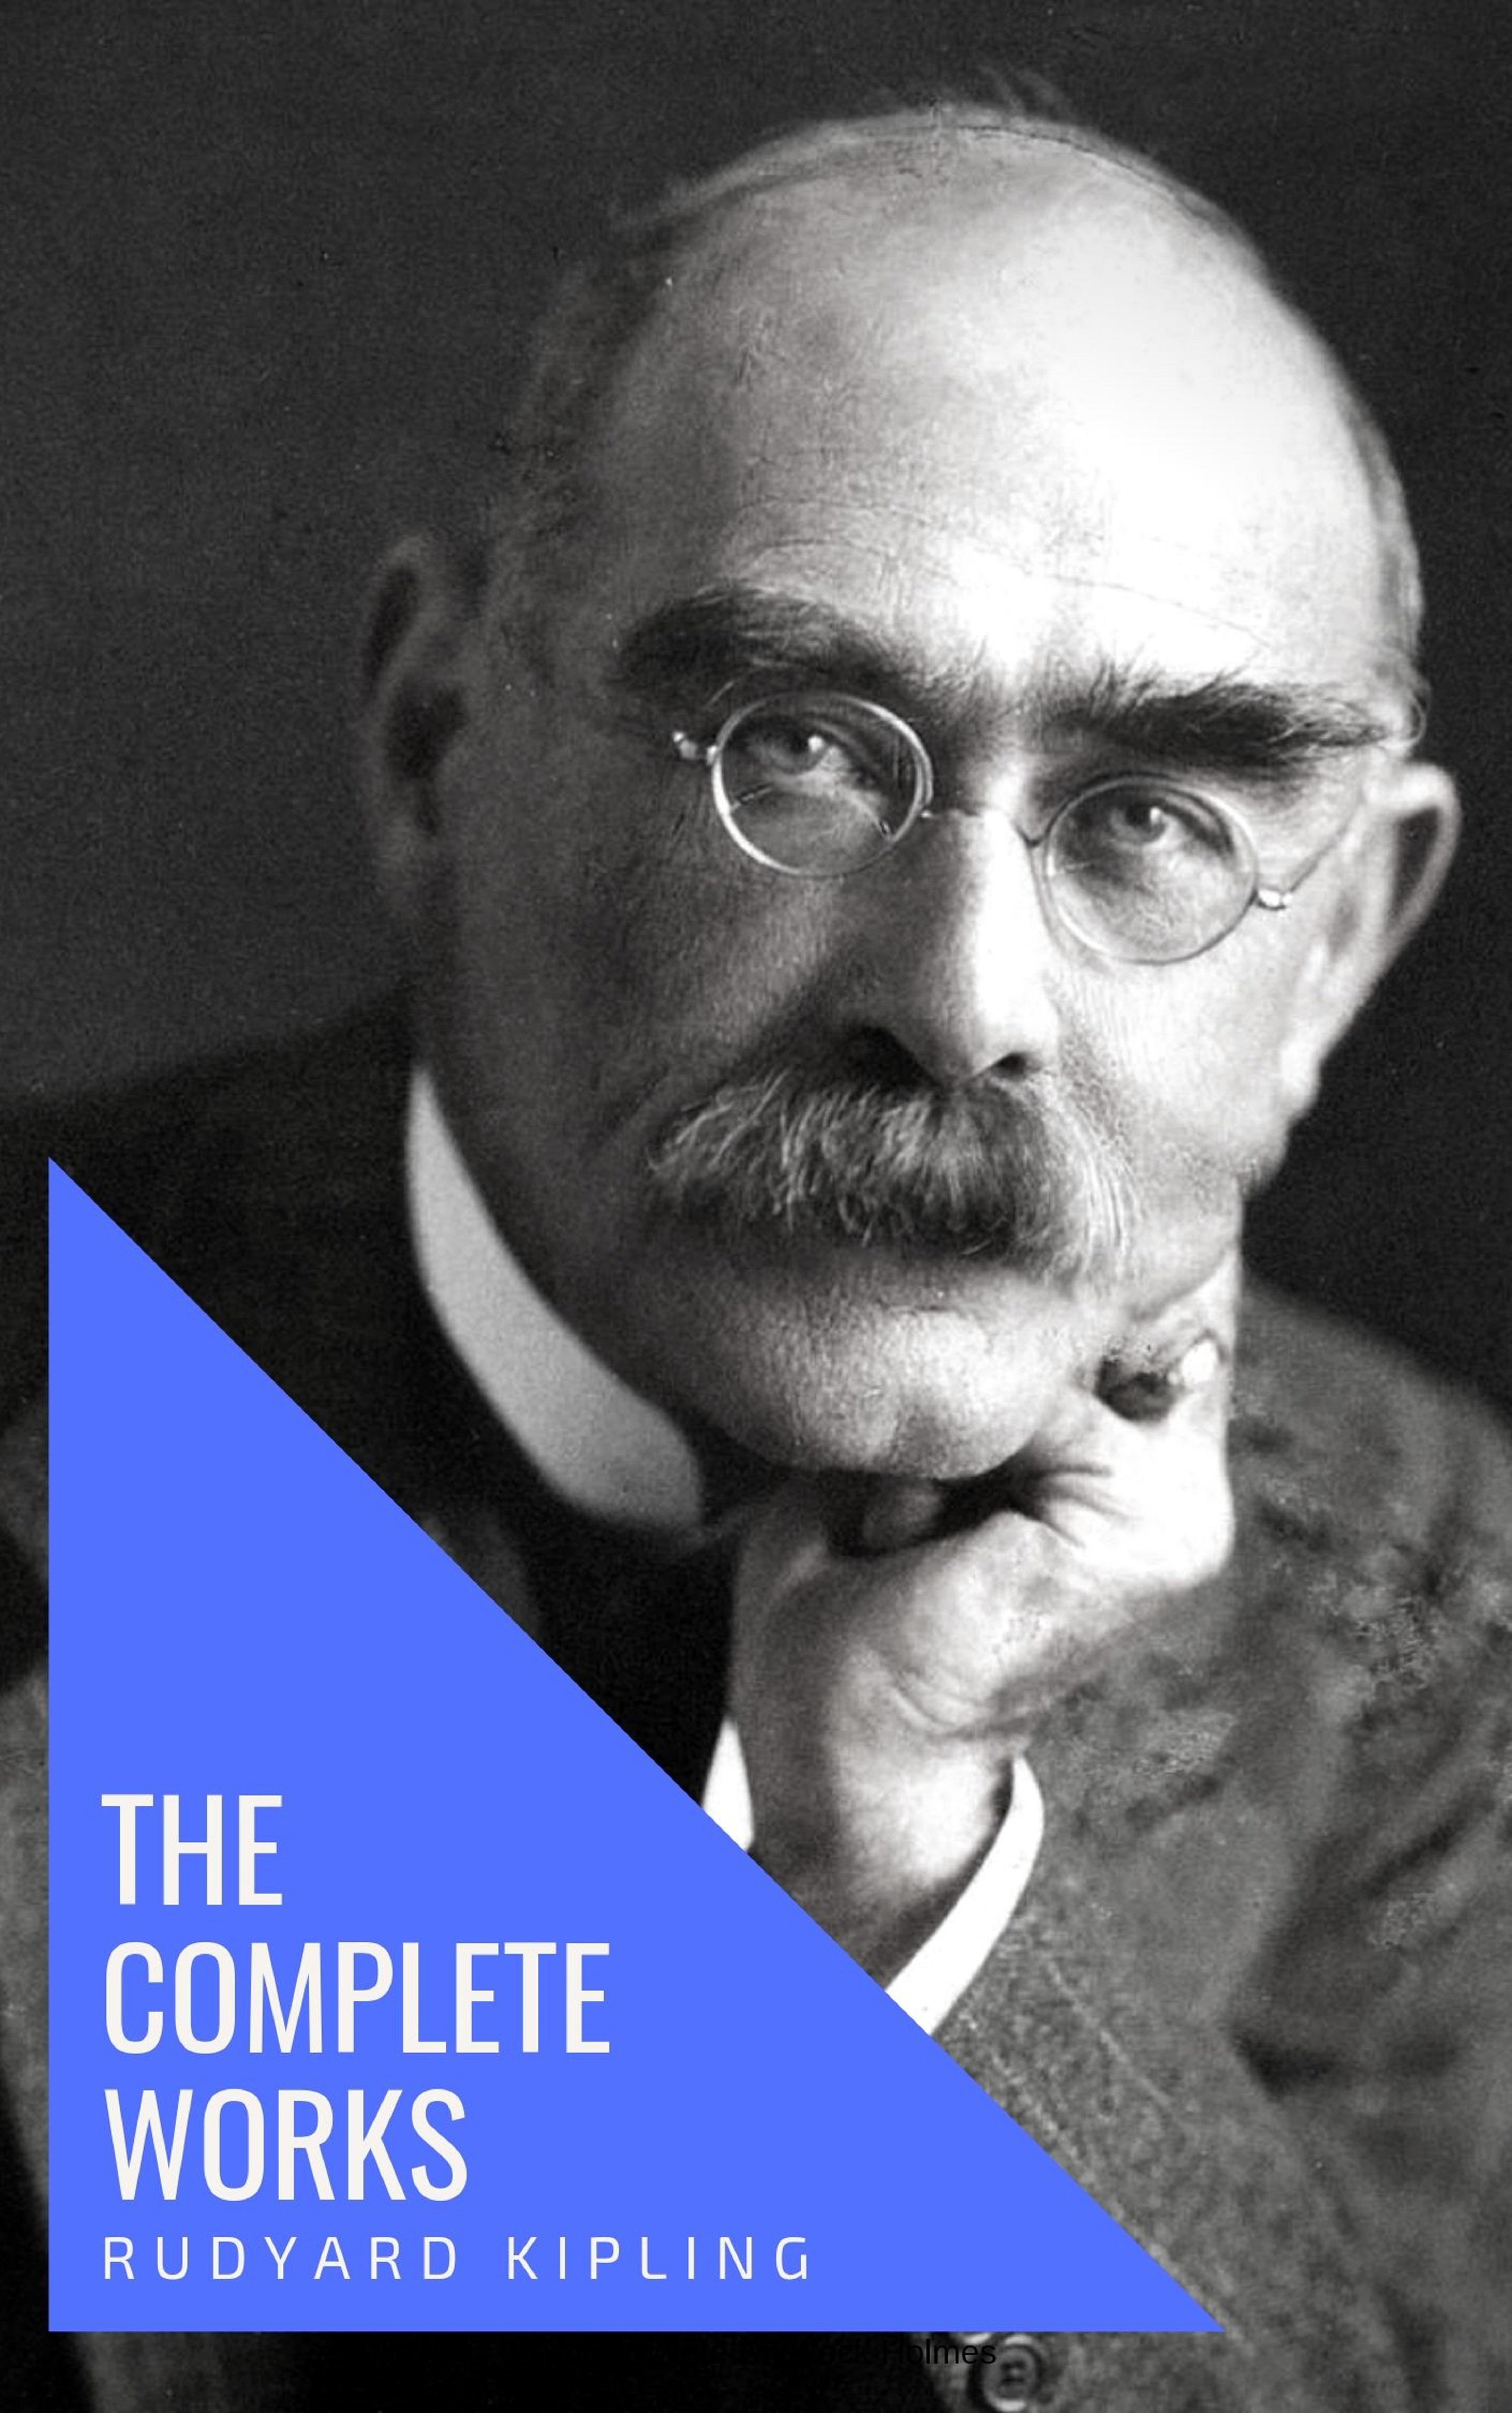 Rudyard 1865-1936 Kipling The Complete Works of Rudyard Kipling полотенцесушитель водяной тера богема люкс с полкой 500х1000 мм псв 36 13